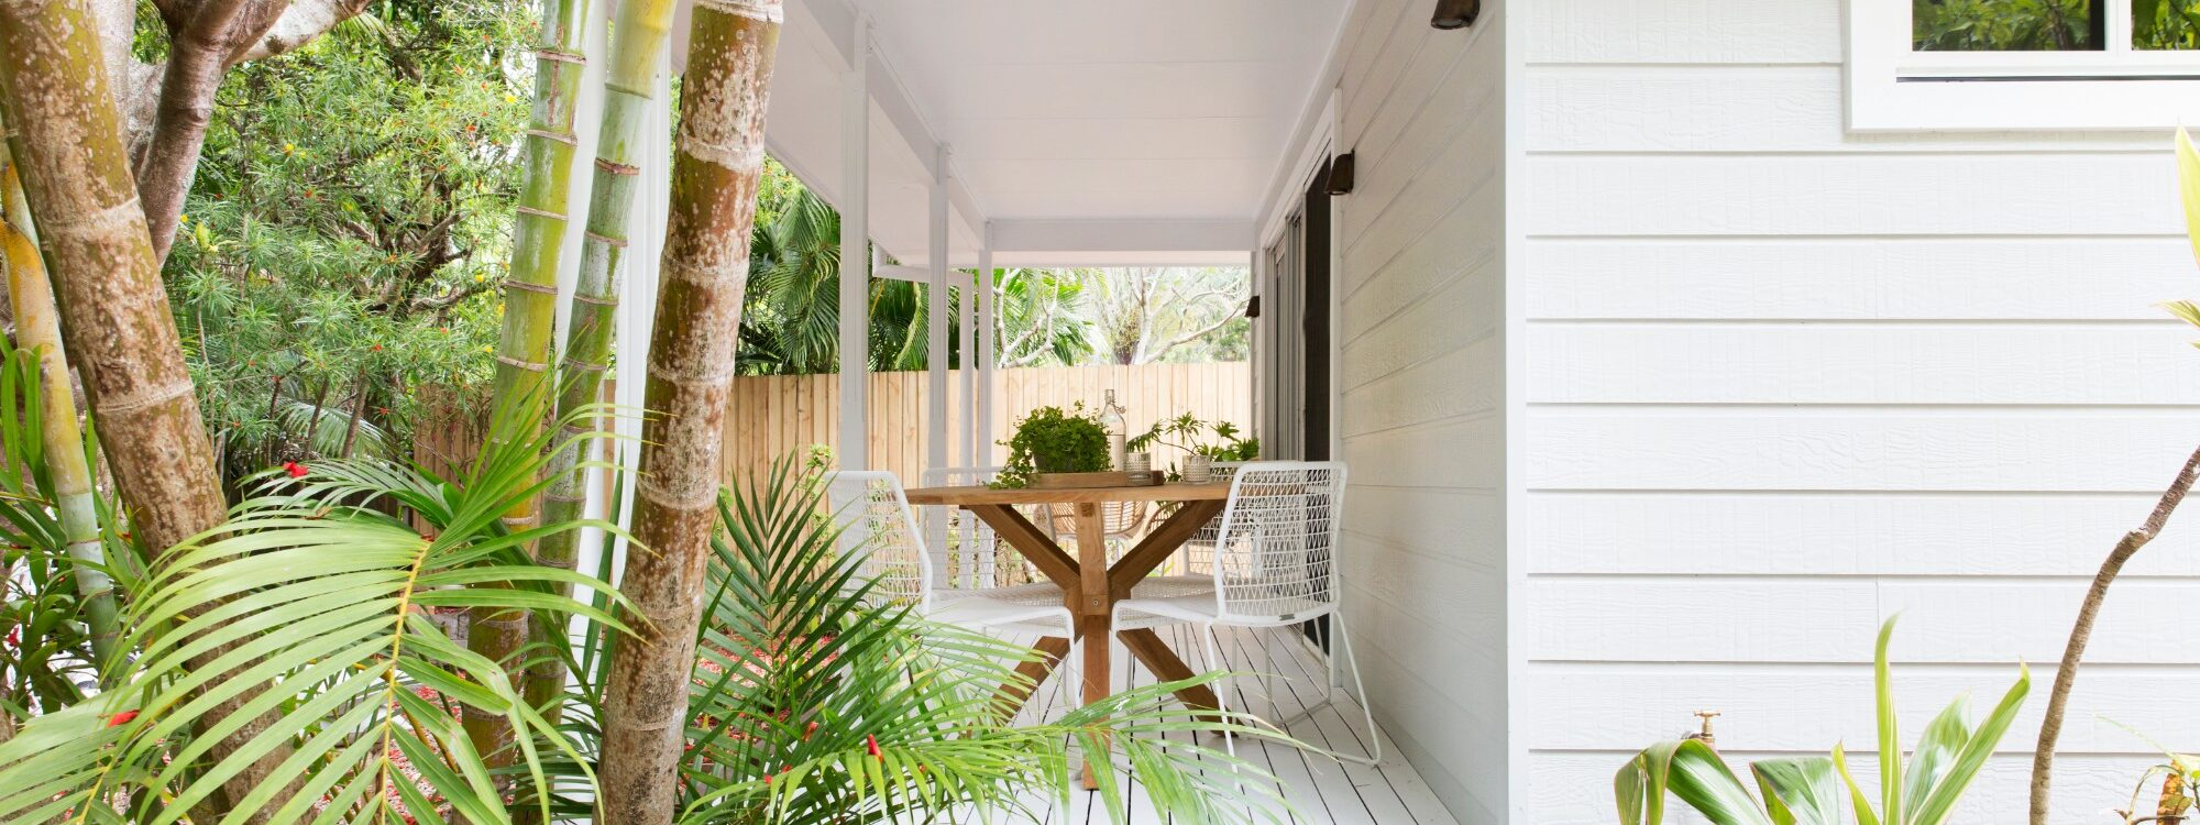 Barrel and Branch - Byron Bay - tropical garden setting